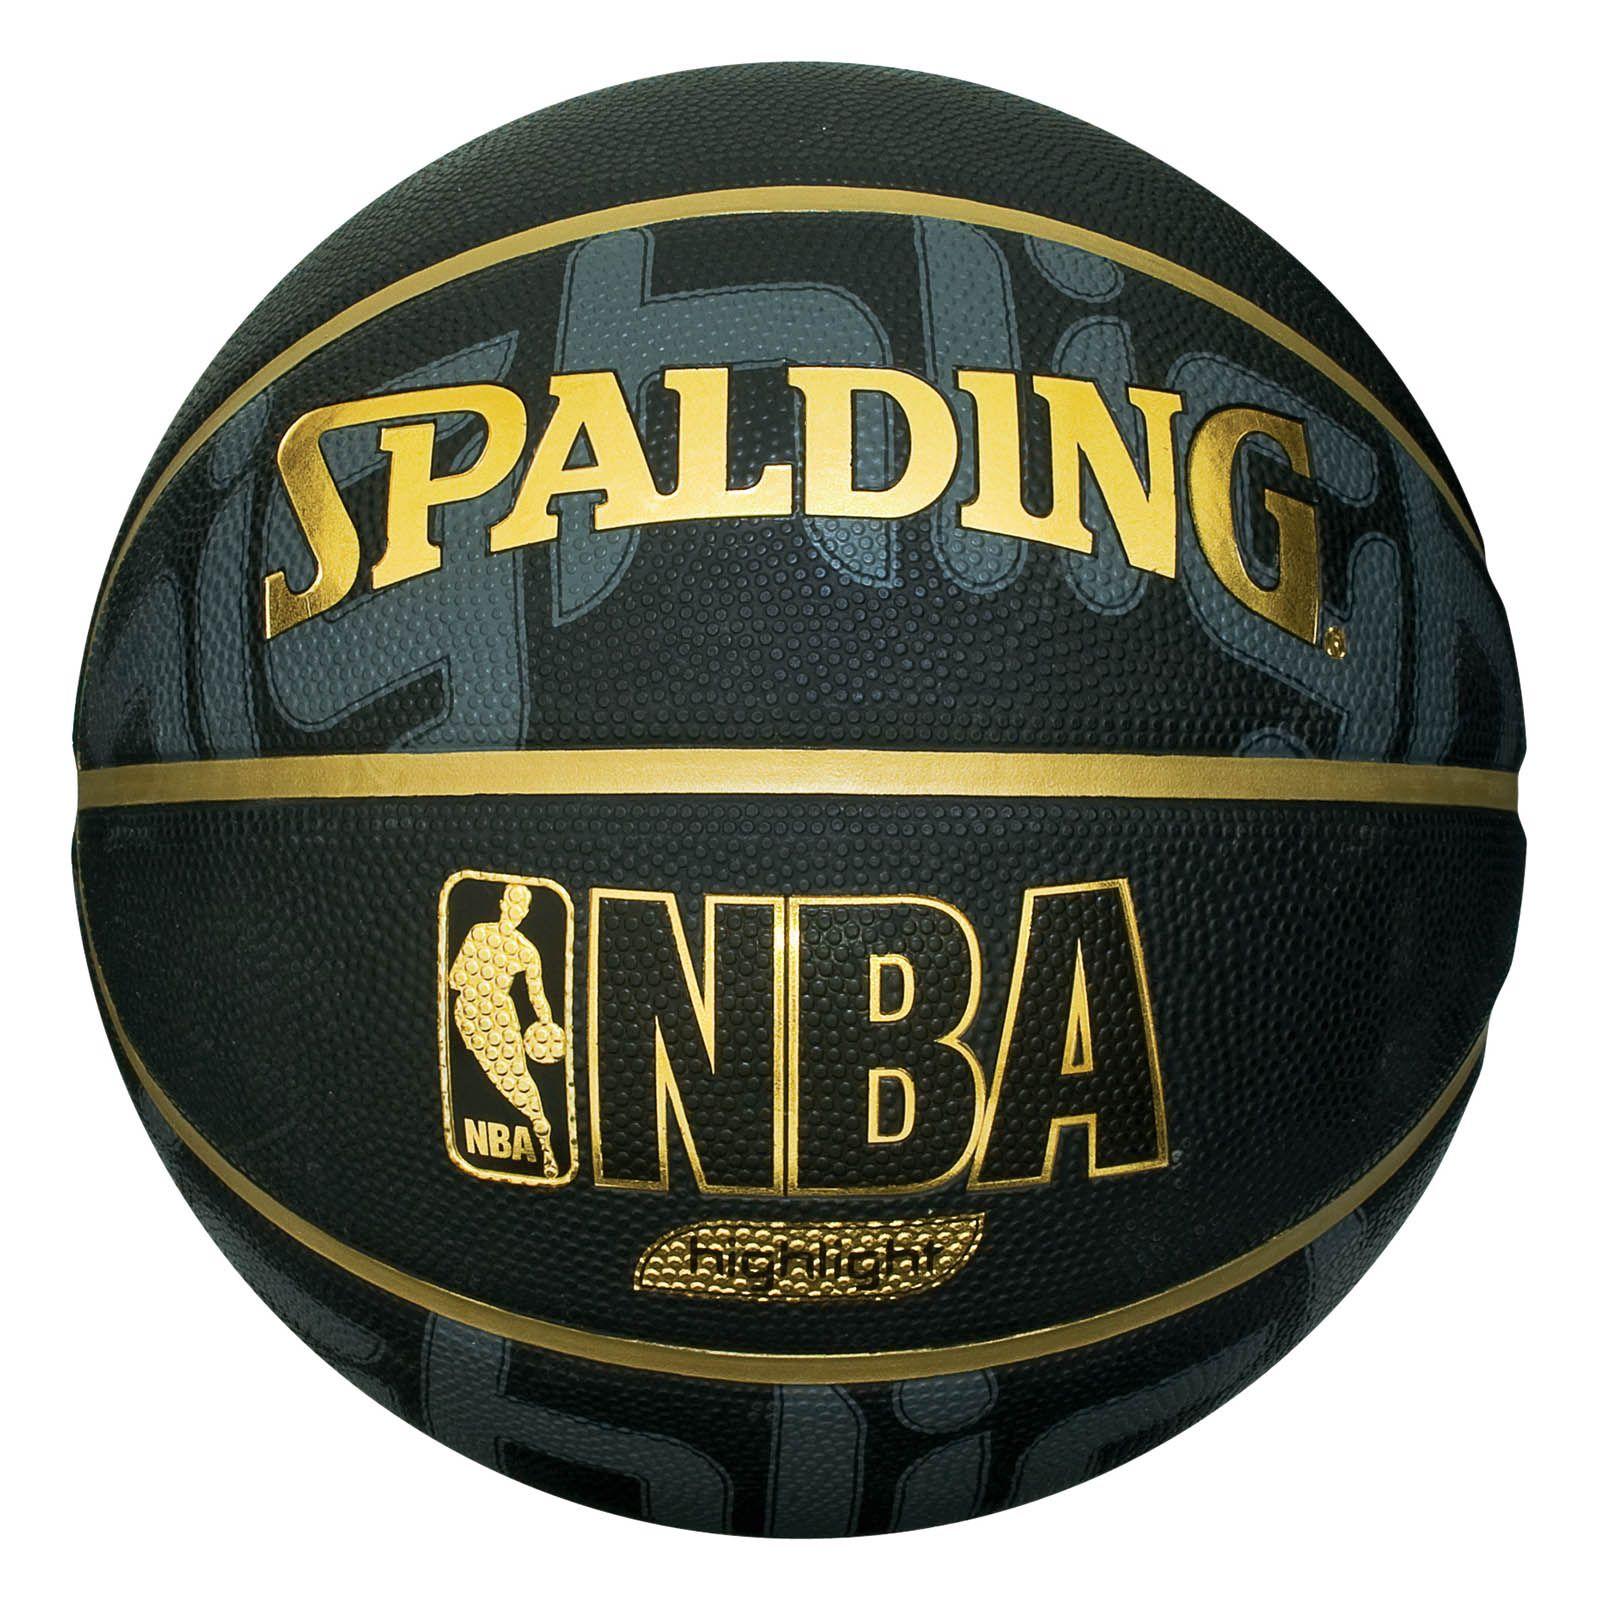 Spalding NBA Highlight Black Basketball - Sweatband.com